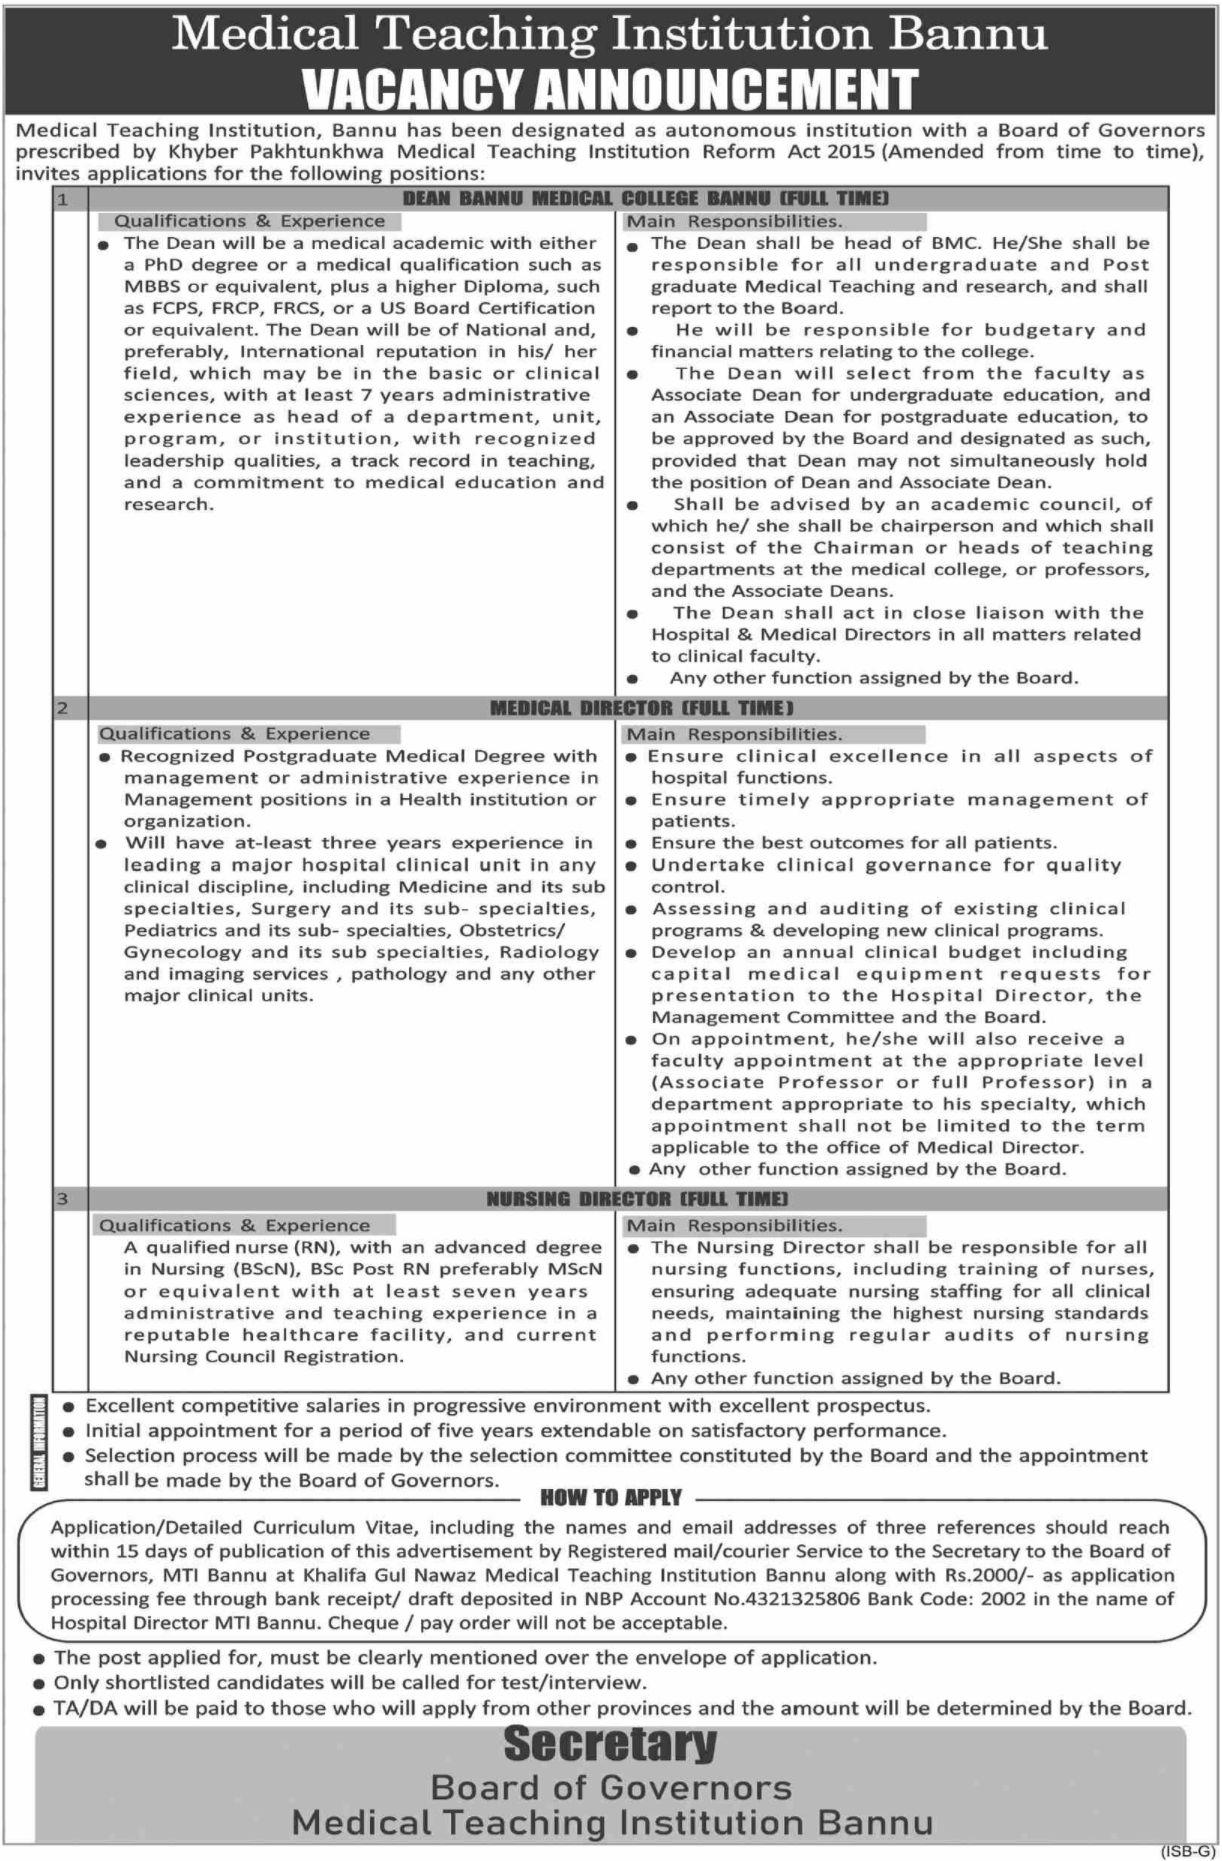 Medical Teaching Institution Bannu Vacancies 2021 3